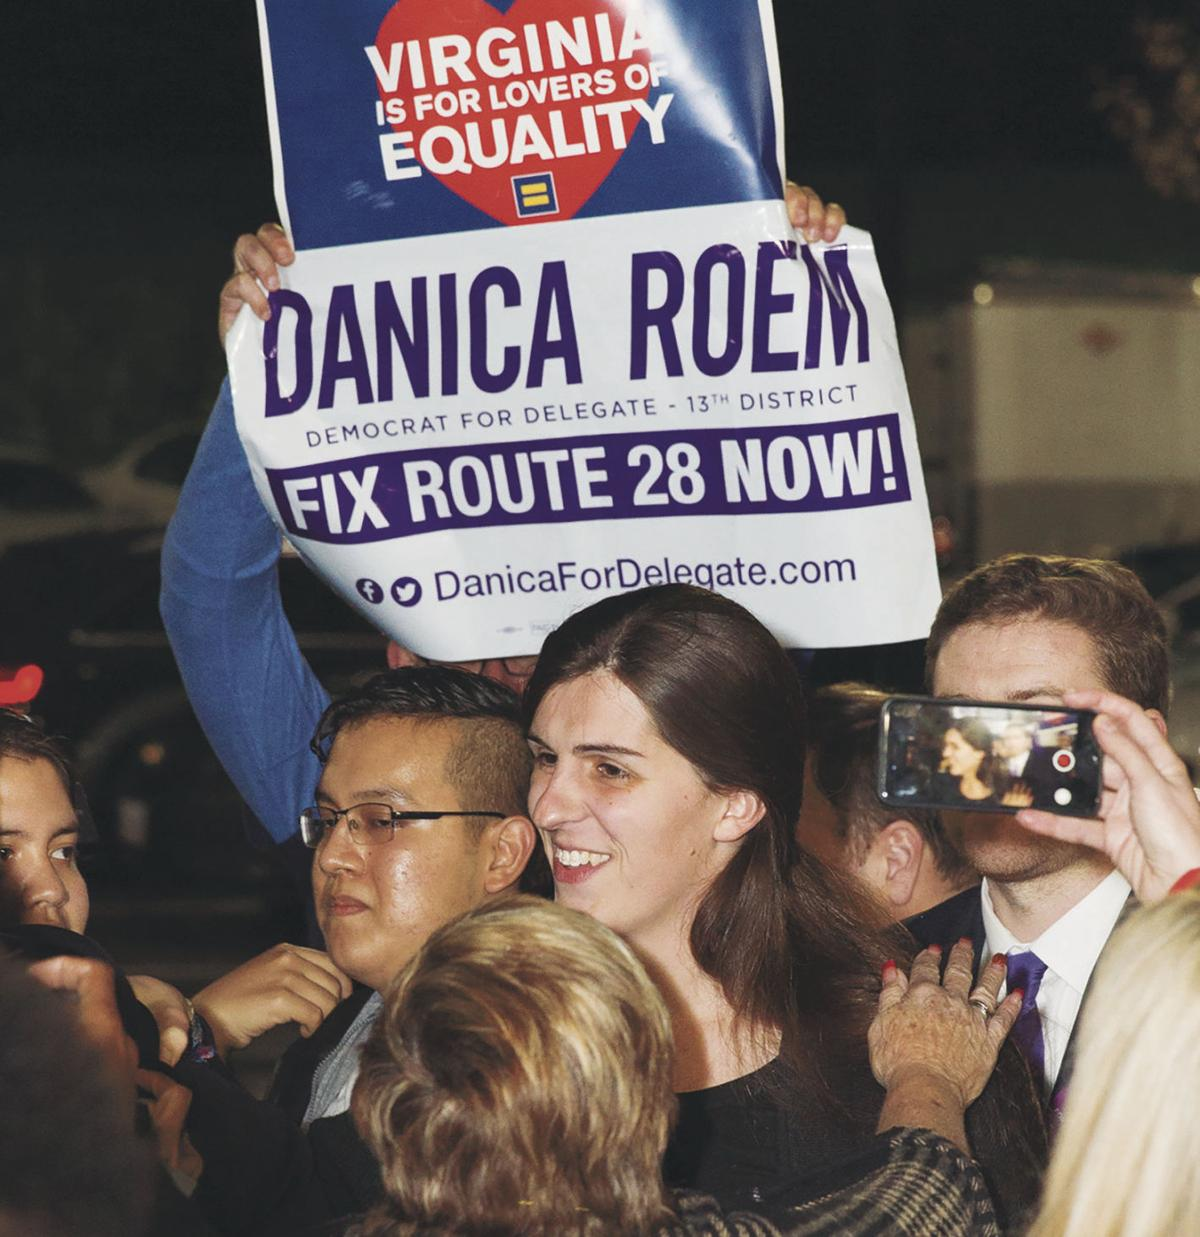 a1 danica Election Night Roem Wins 01.jpg